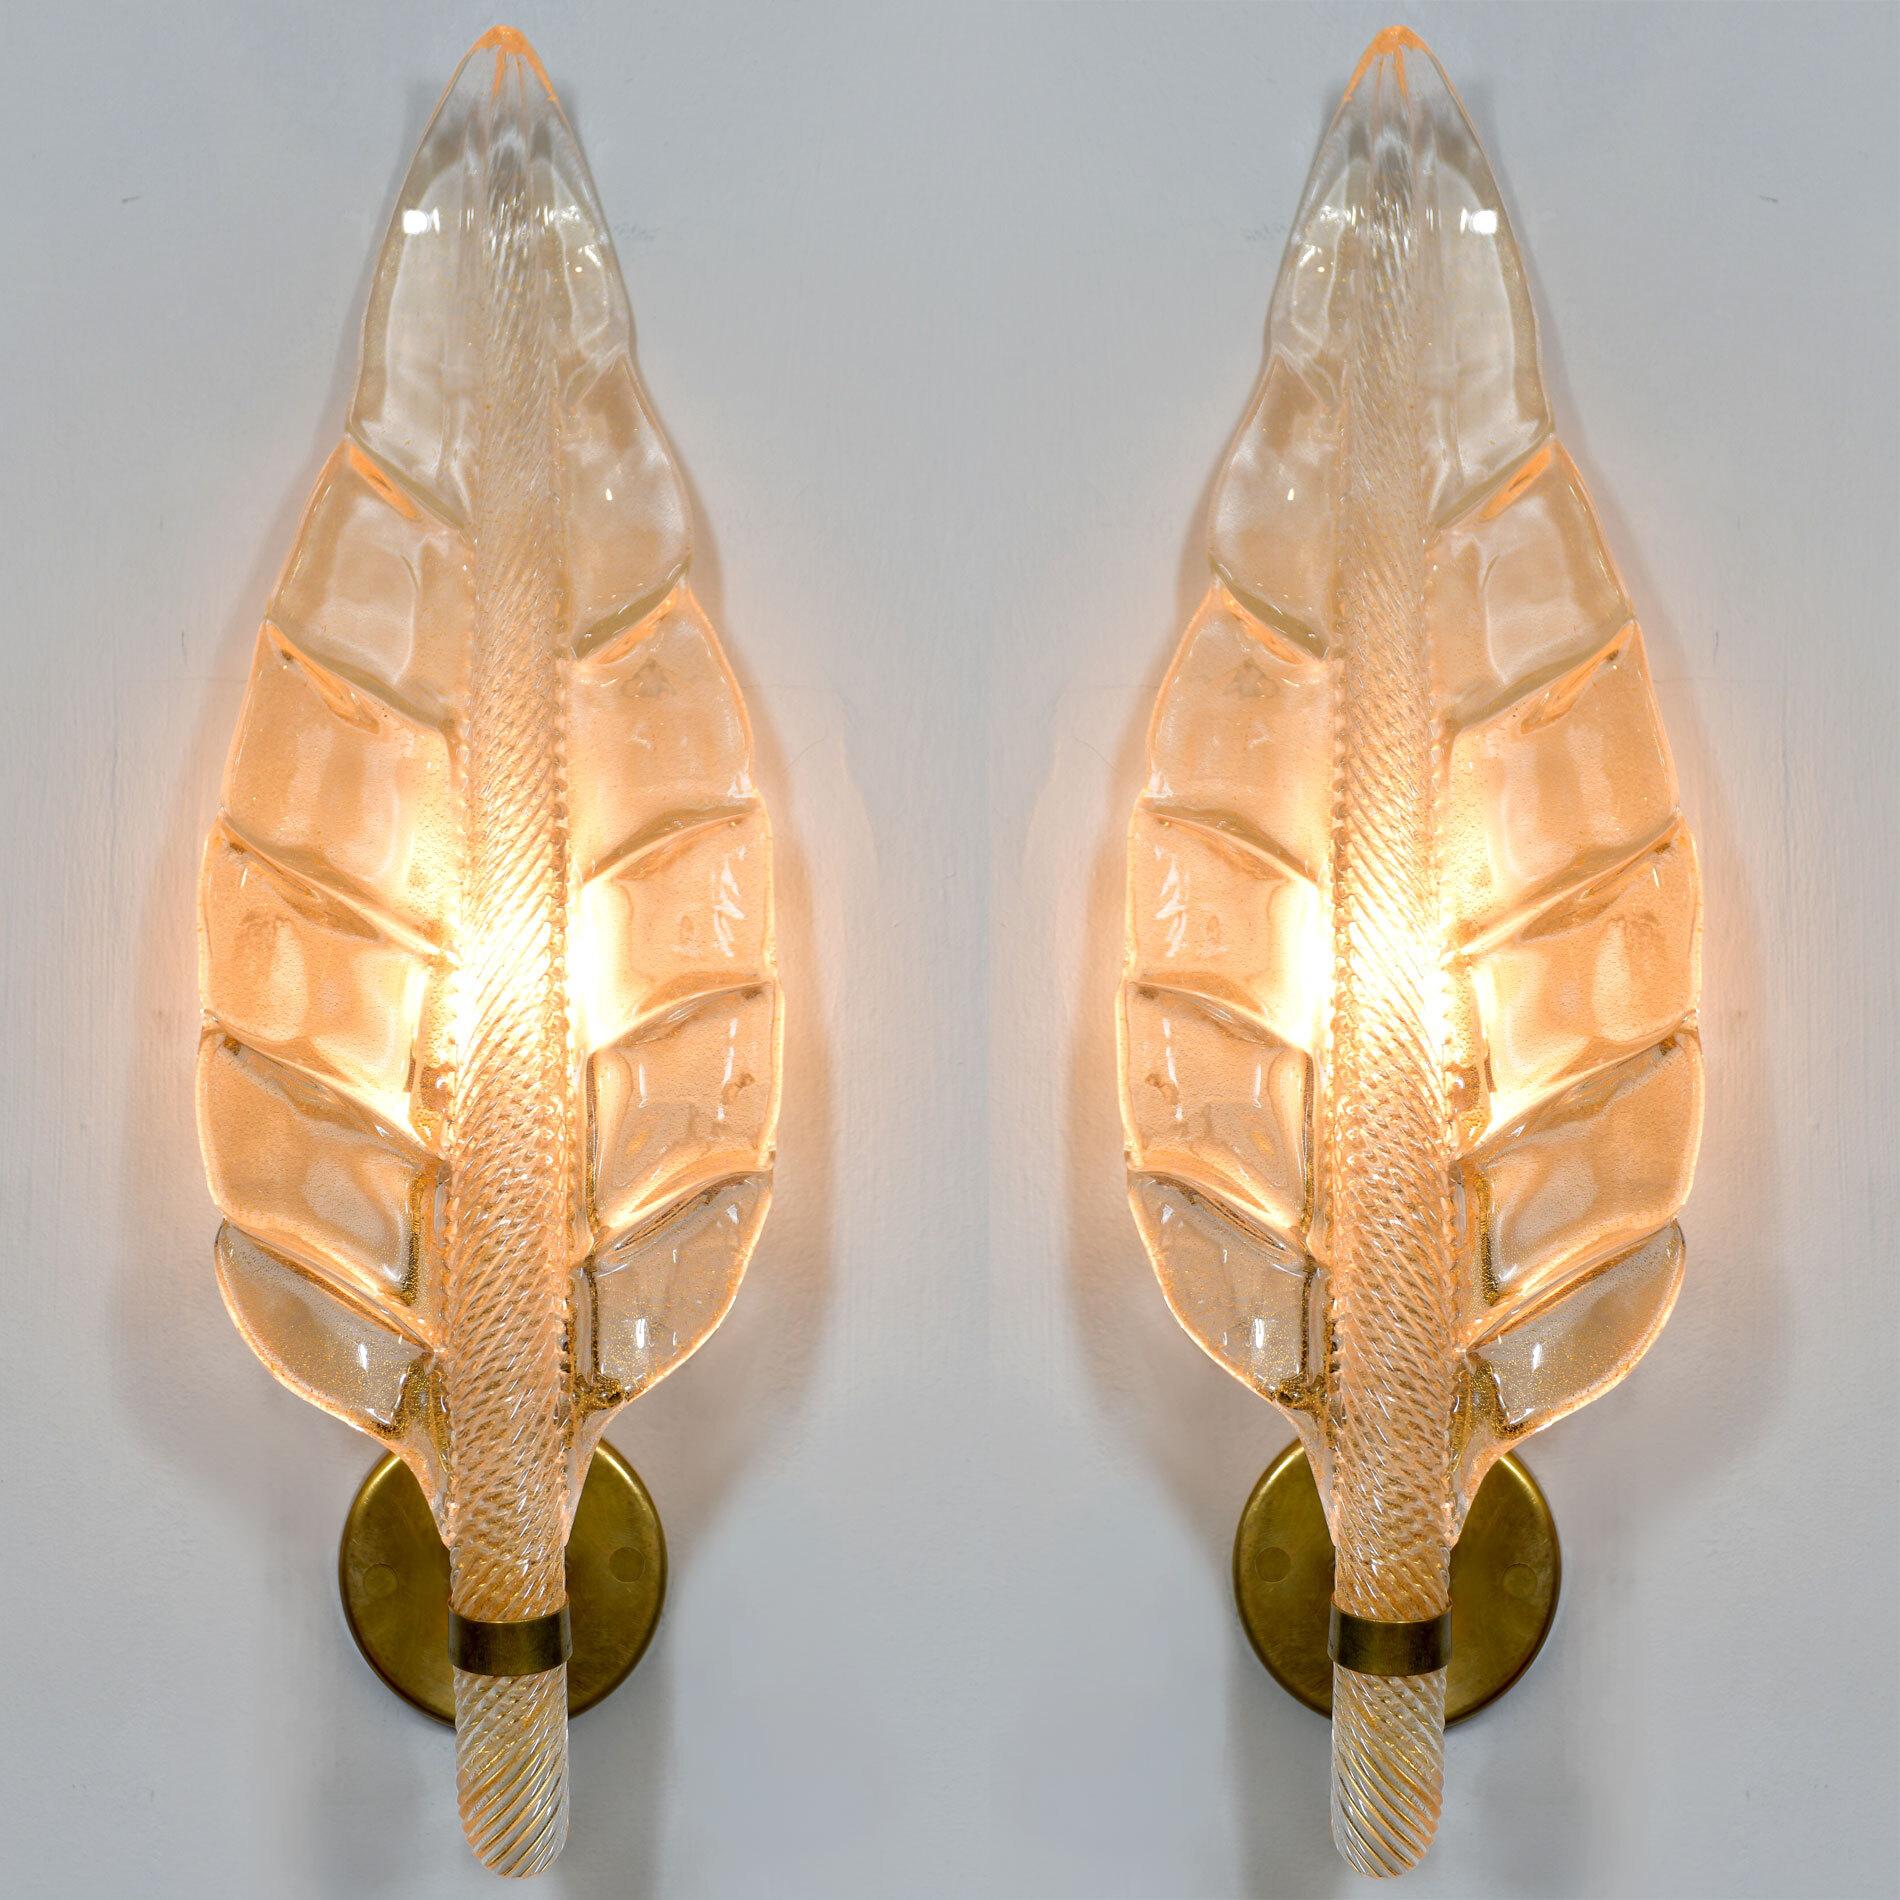 1960S Italian Sugoso Wall Lights 01